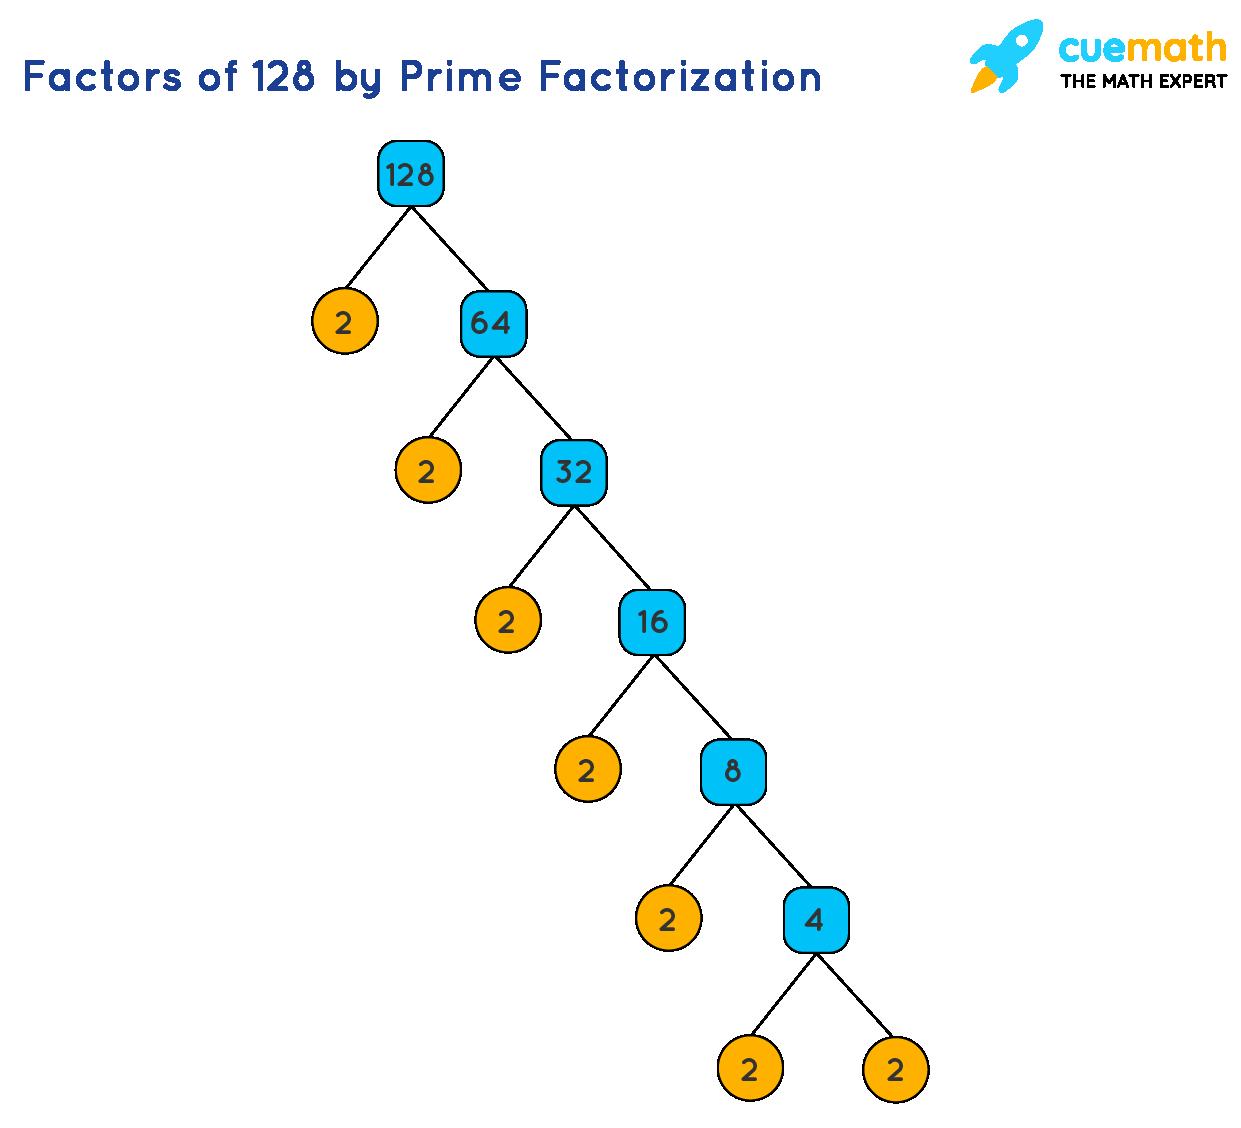 Factors of 128 by Prime Factorization